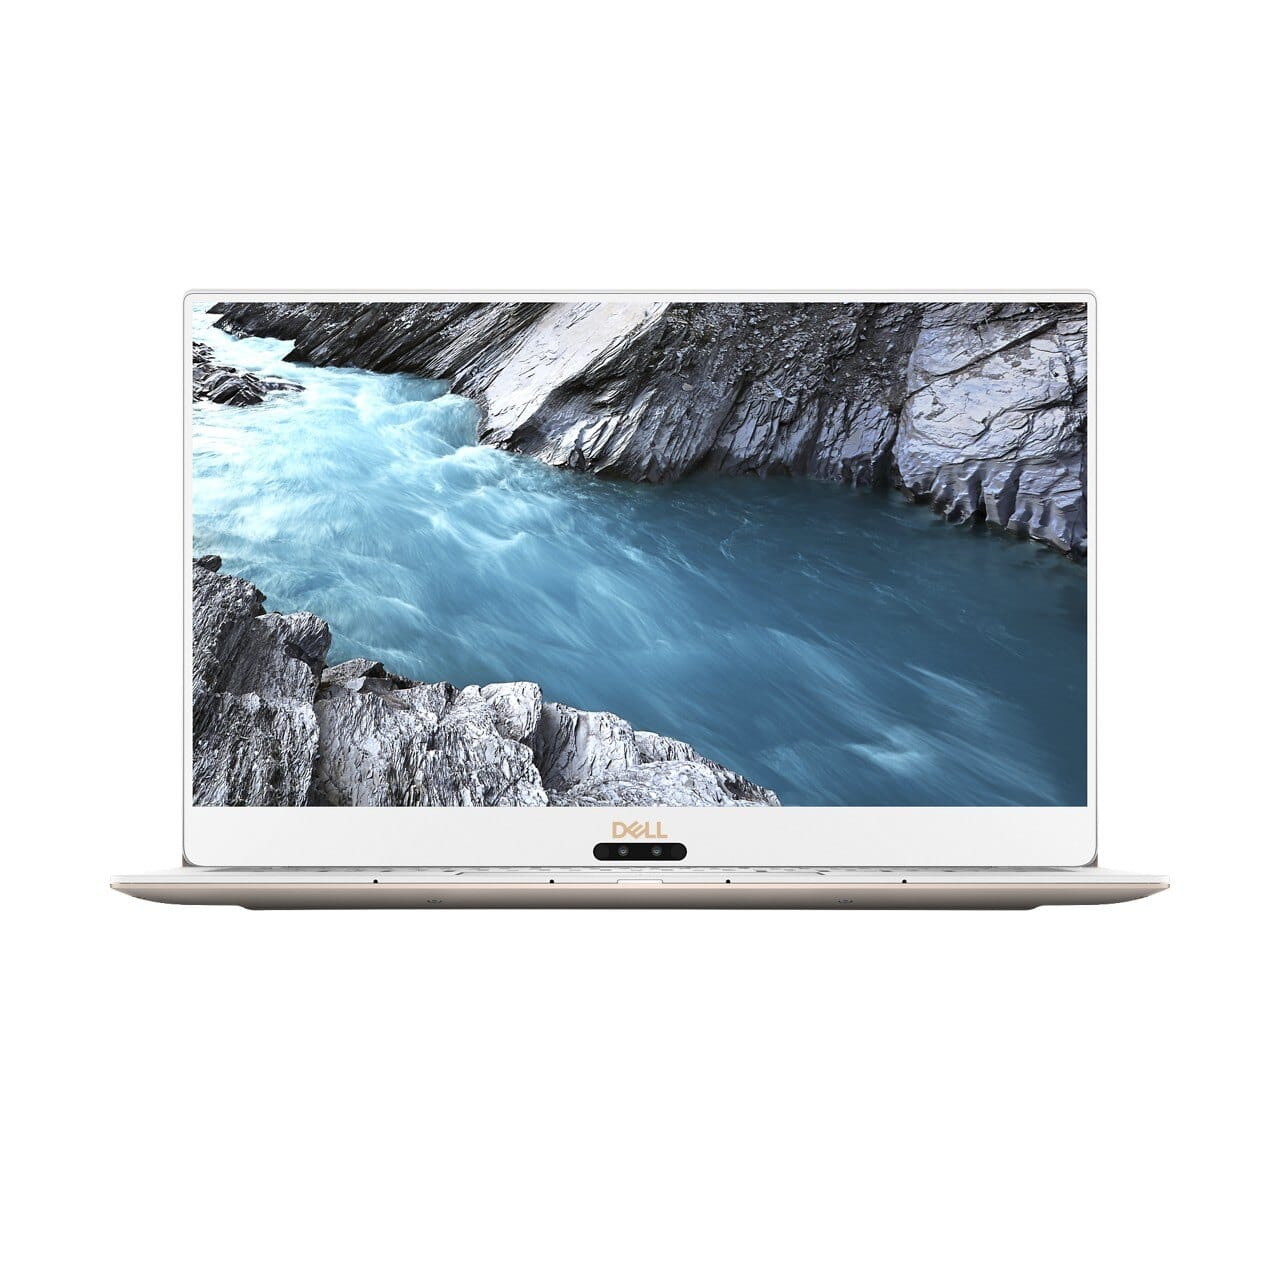 Dell XPS 13 9370 Laptop: Intel Core I7-8550U, 13.3'' 4K Touchscreen, 16GB DDR3, 512GB SSD, Win 10 + $65.94 Back In Points $1099.99 AC + Free Shipping @ Rakuten